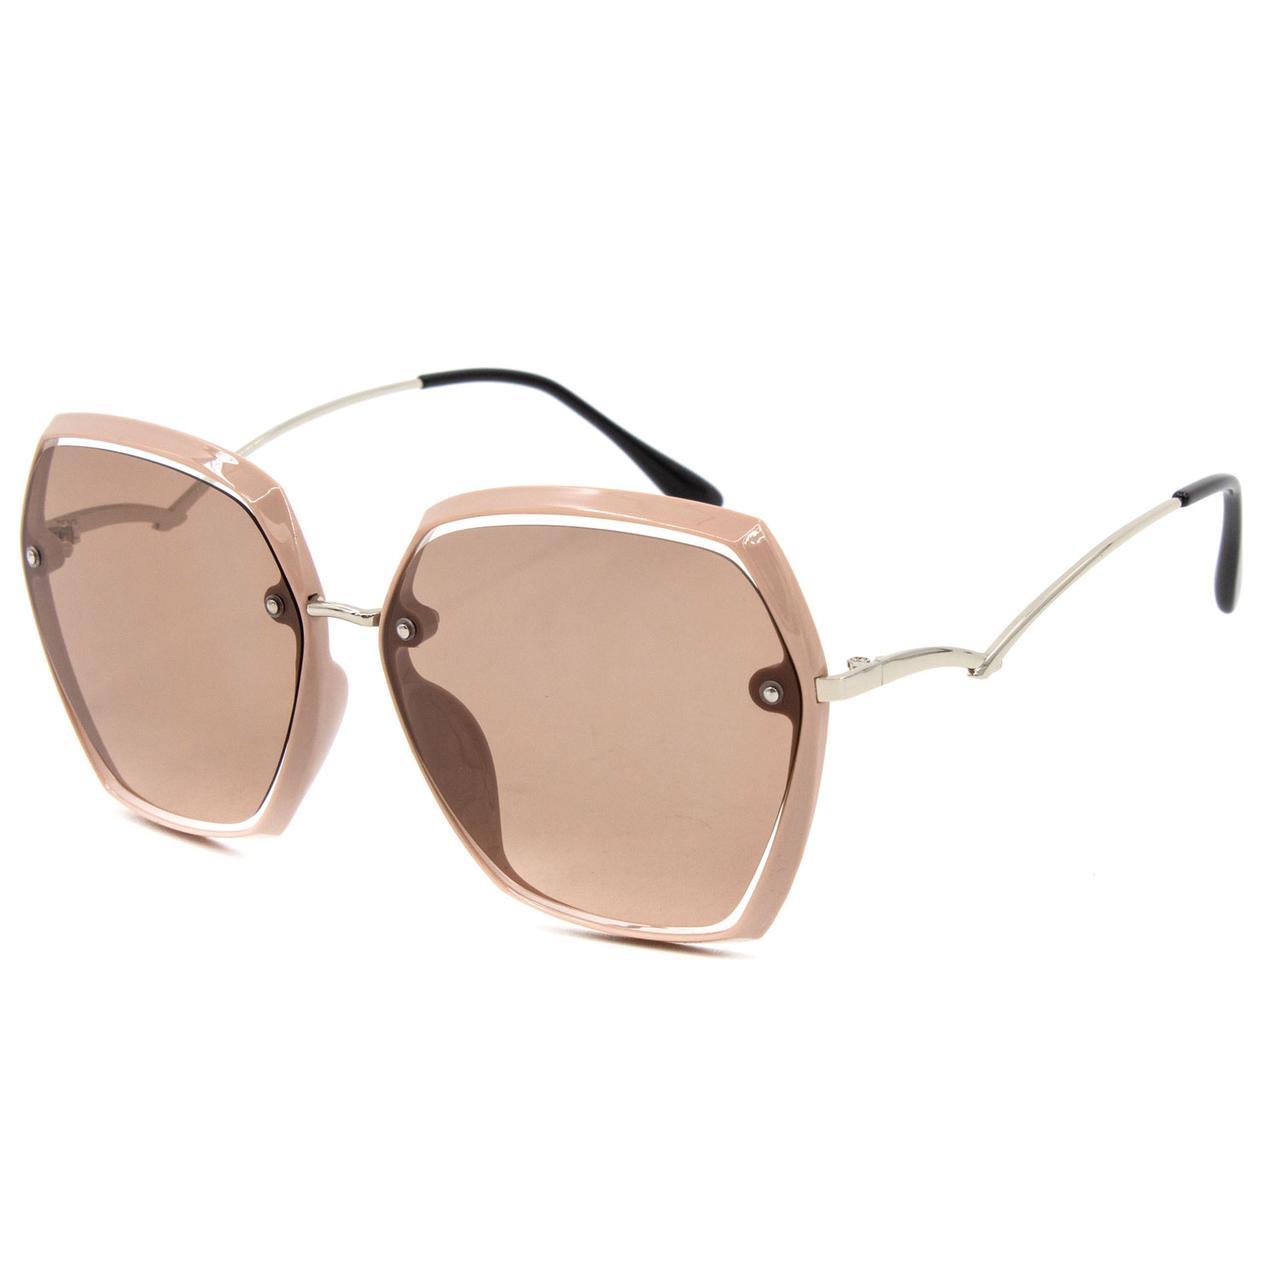 Солнцезащитные очки Marmilen Polar 2206 T28     ( 2206-T28 )